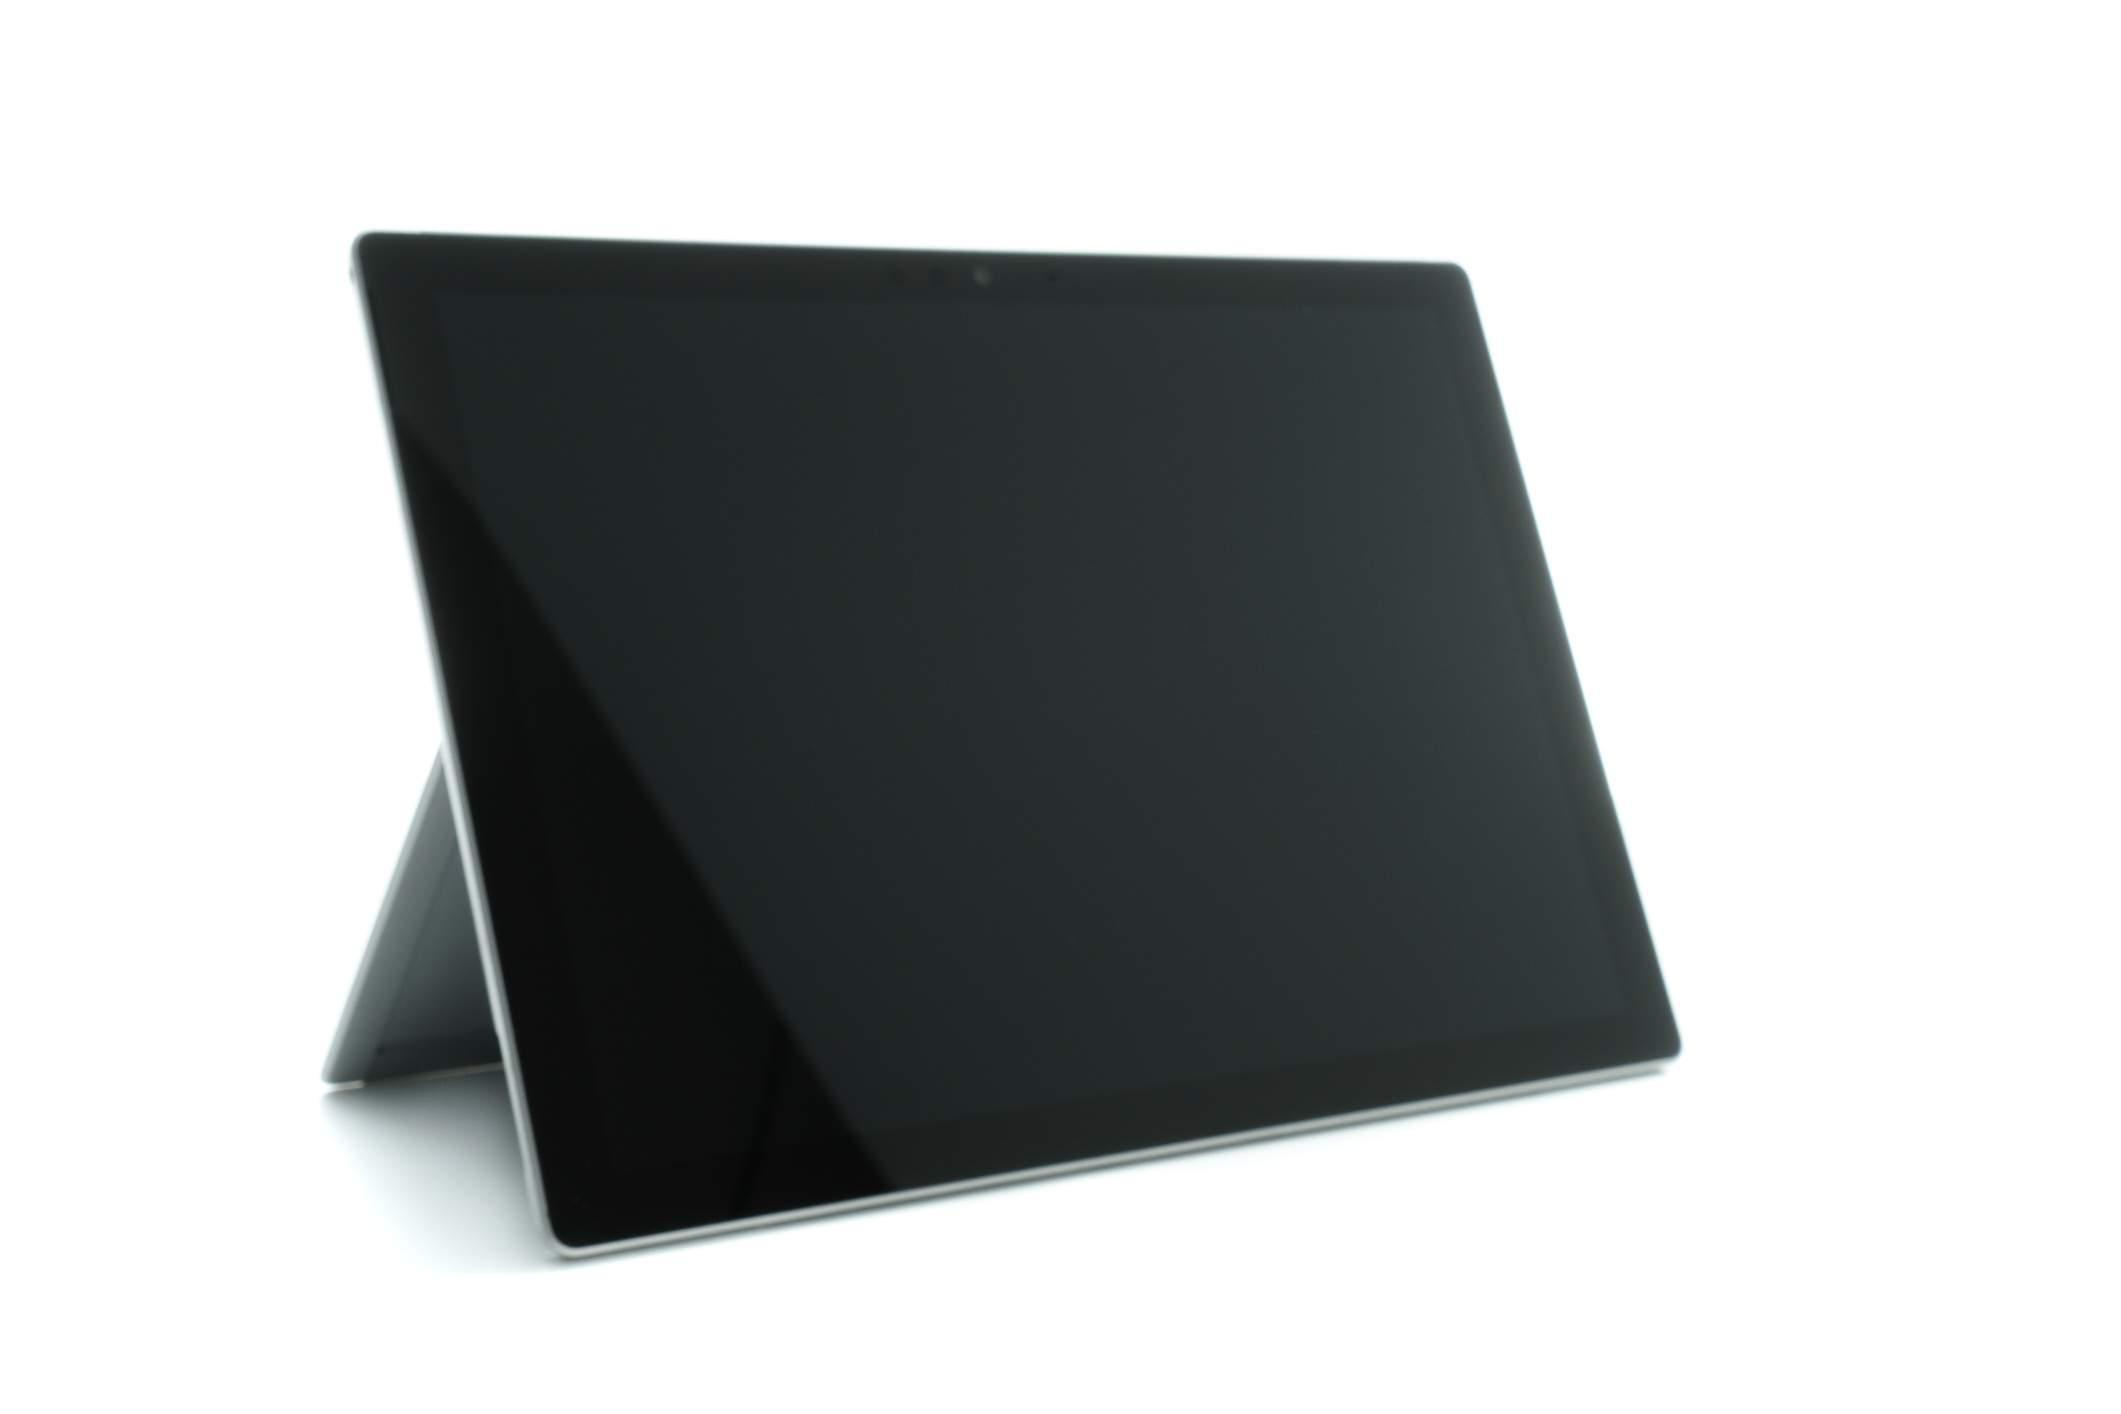 725edabdf9a Microsoft Surface Pro - Intel Core i7 Processor, 512GB Storage, 16GB ...